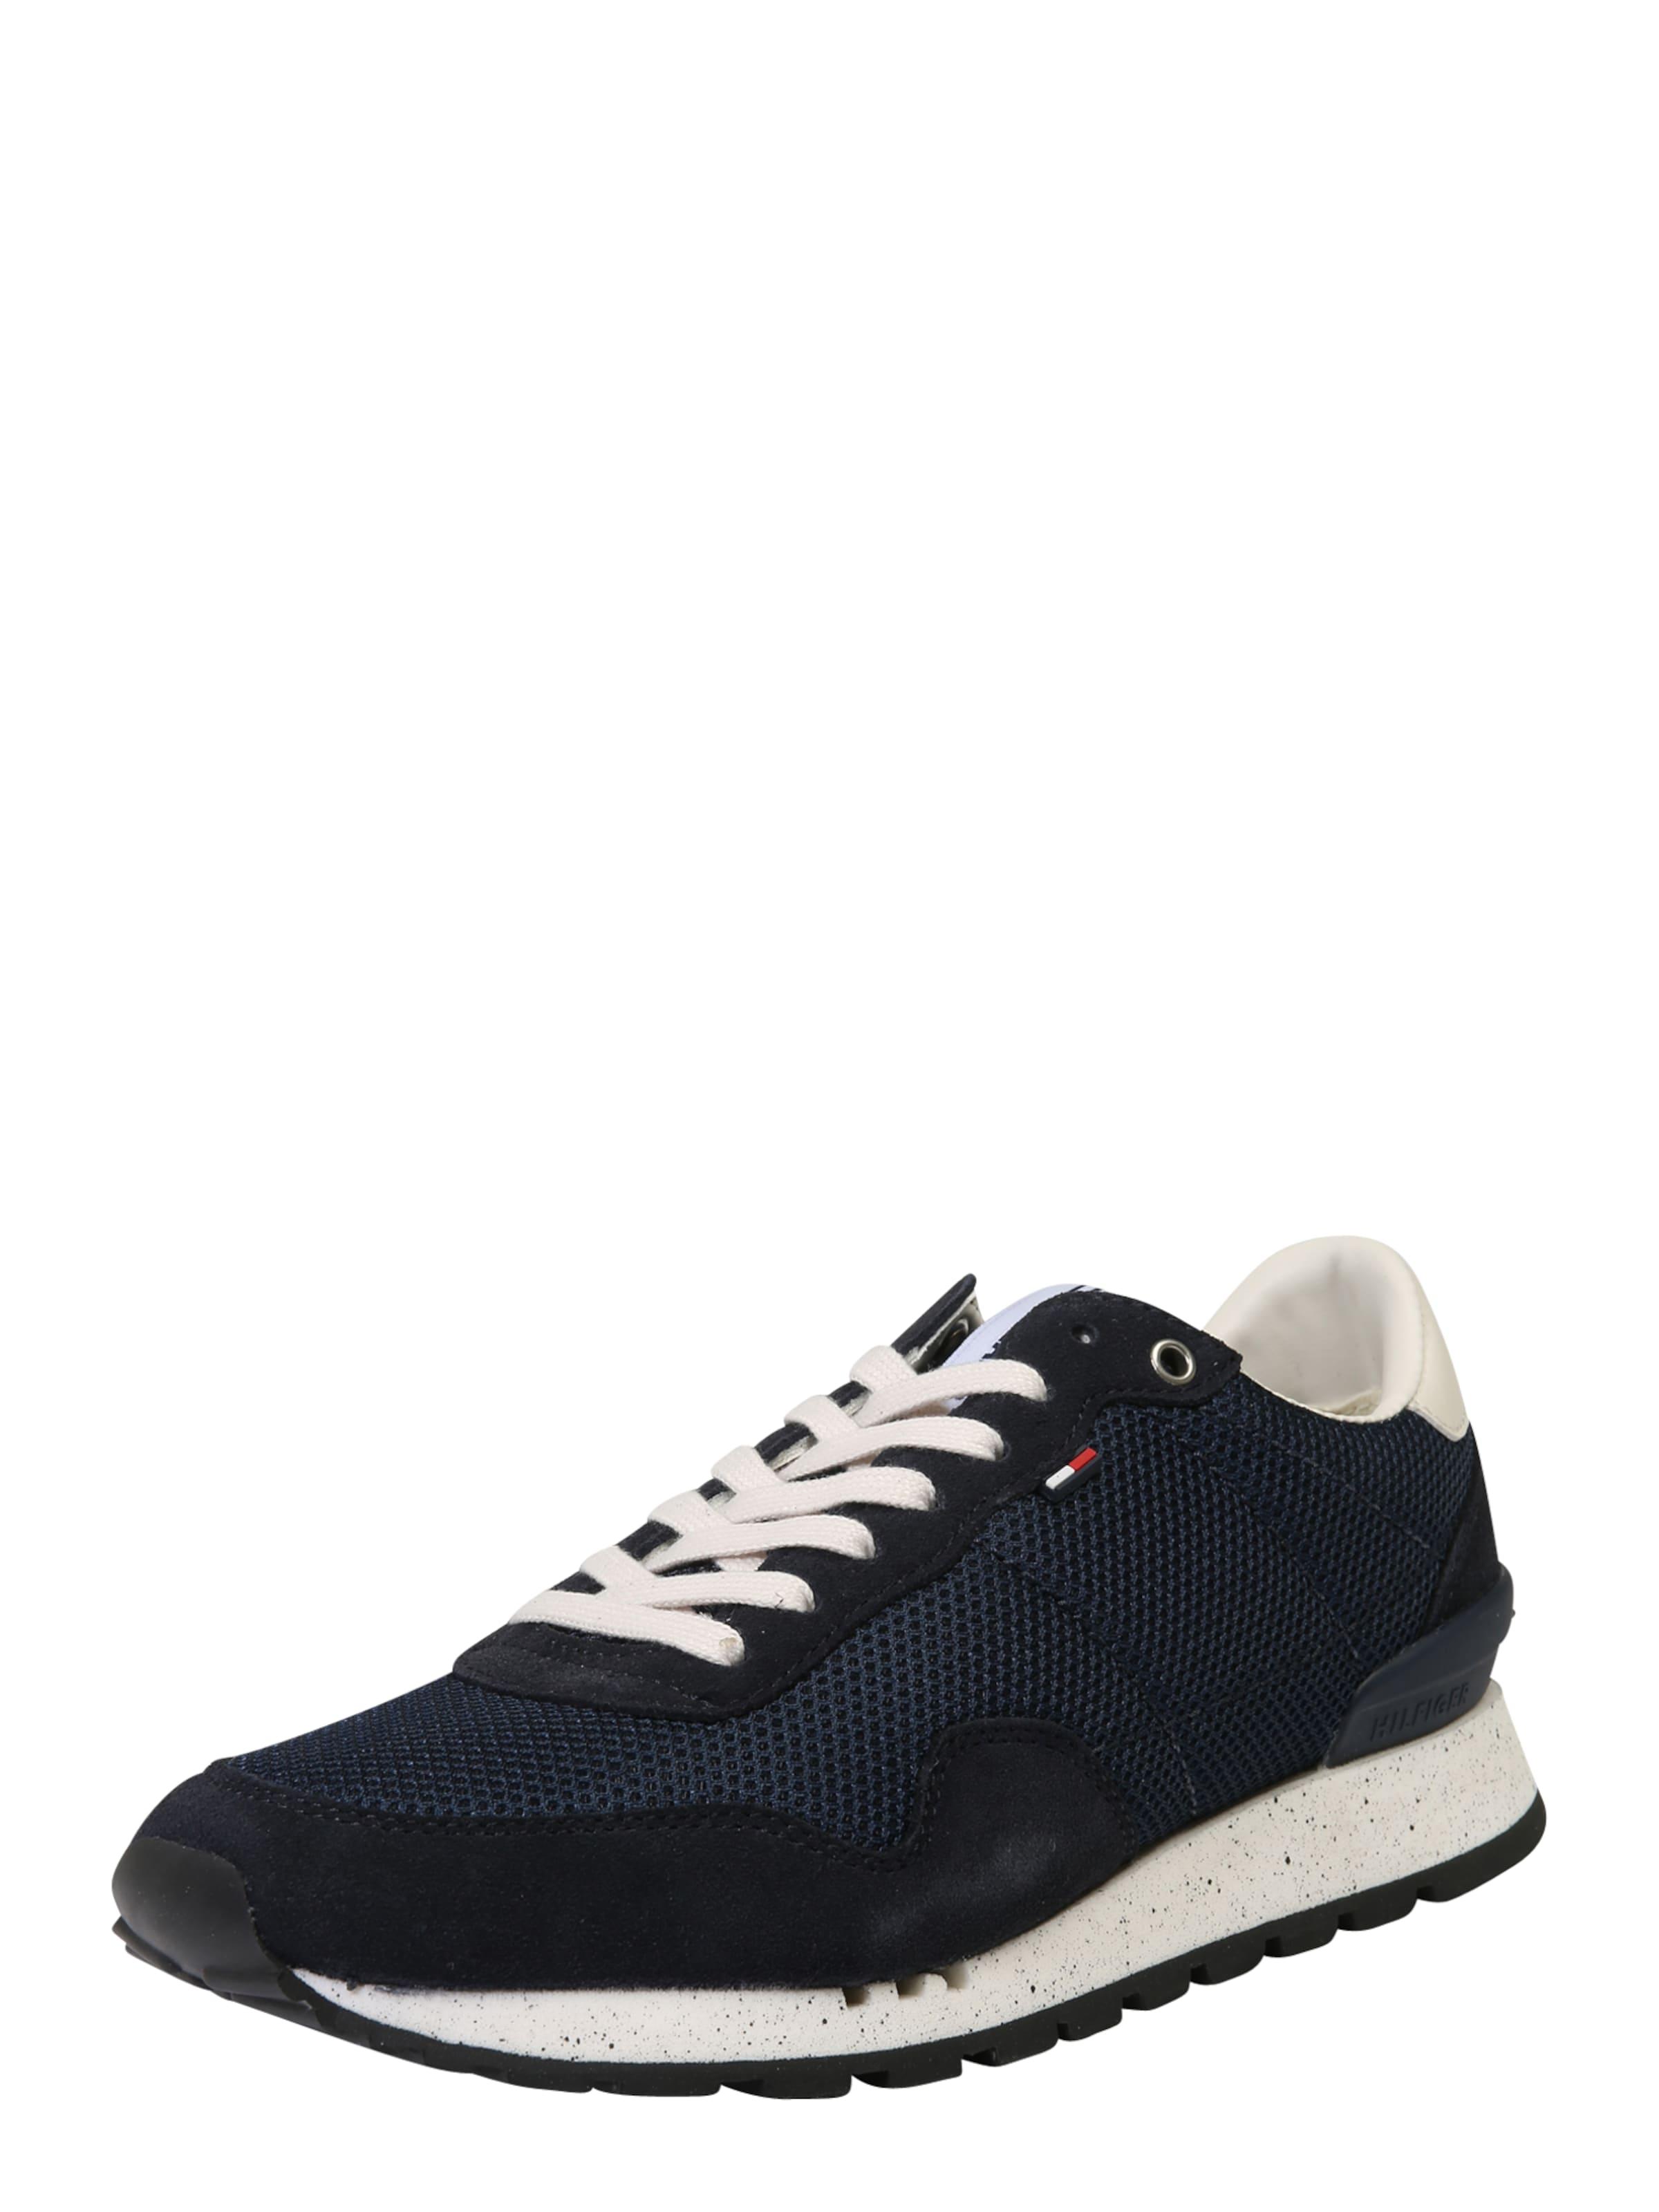 Haltbare 'LIFESTYLE' Mode billige Schuhe Tommy Jeans   Sneaker 'LIFESTYLE' Haltbare Schuhe Gut getragene Schuhe 8e0de4